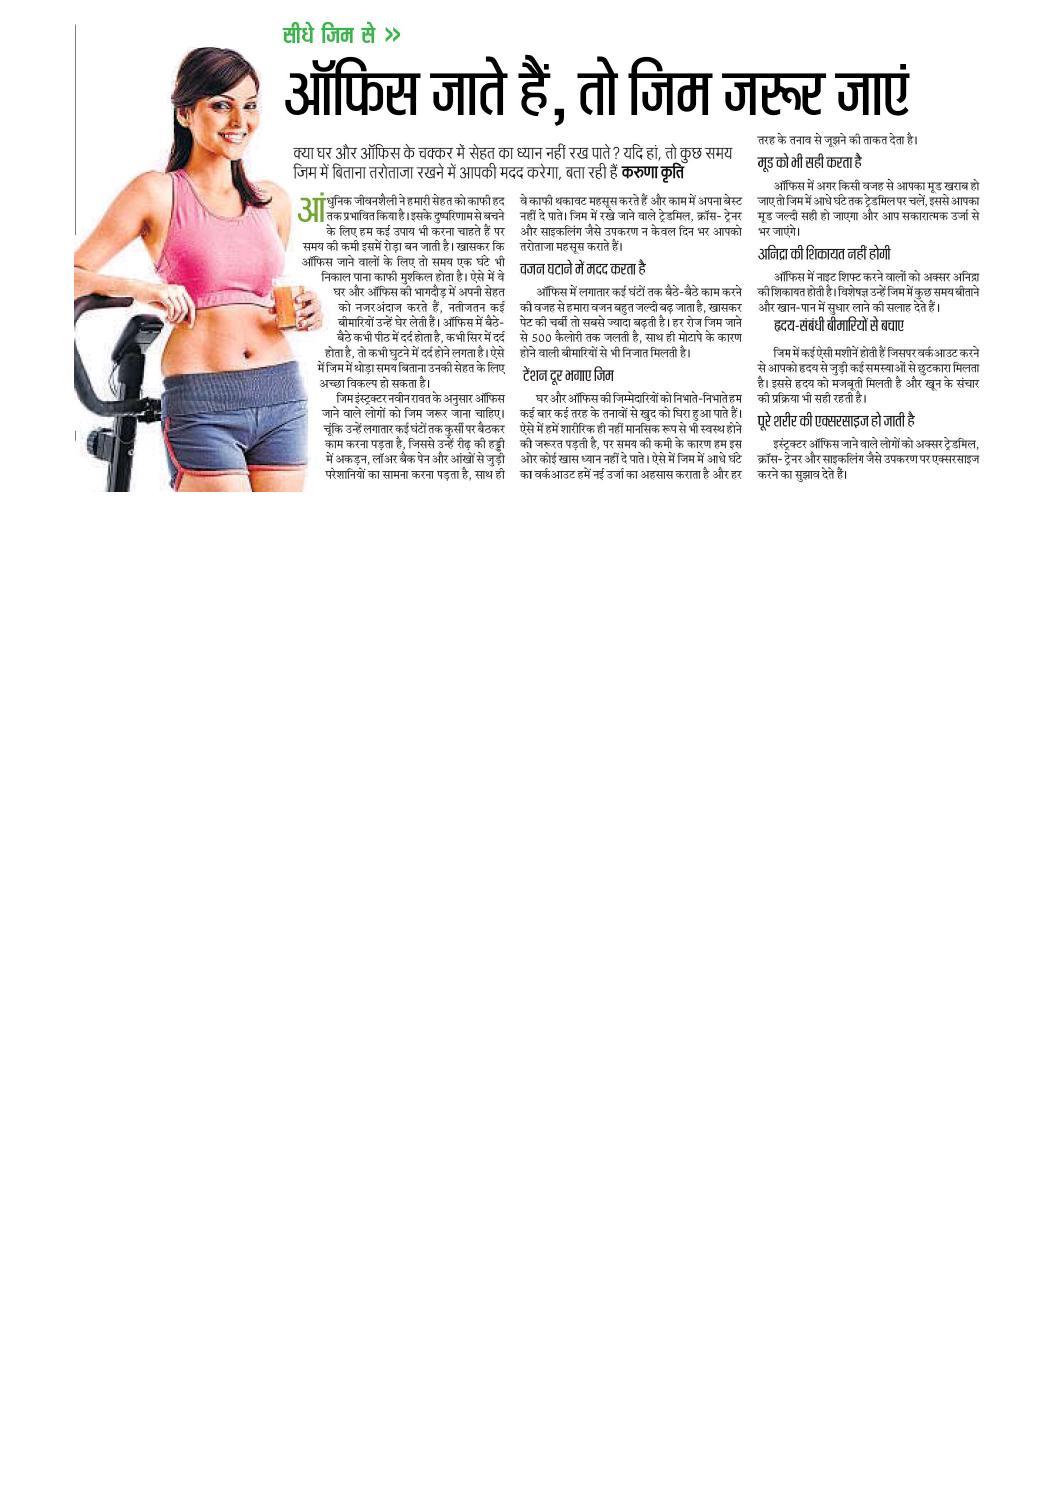 Hindustan times epaper, english news paper, today newspaper.